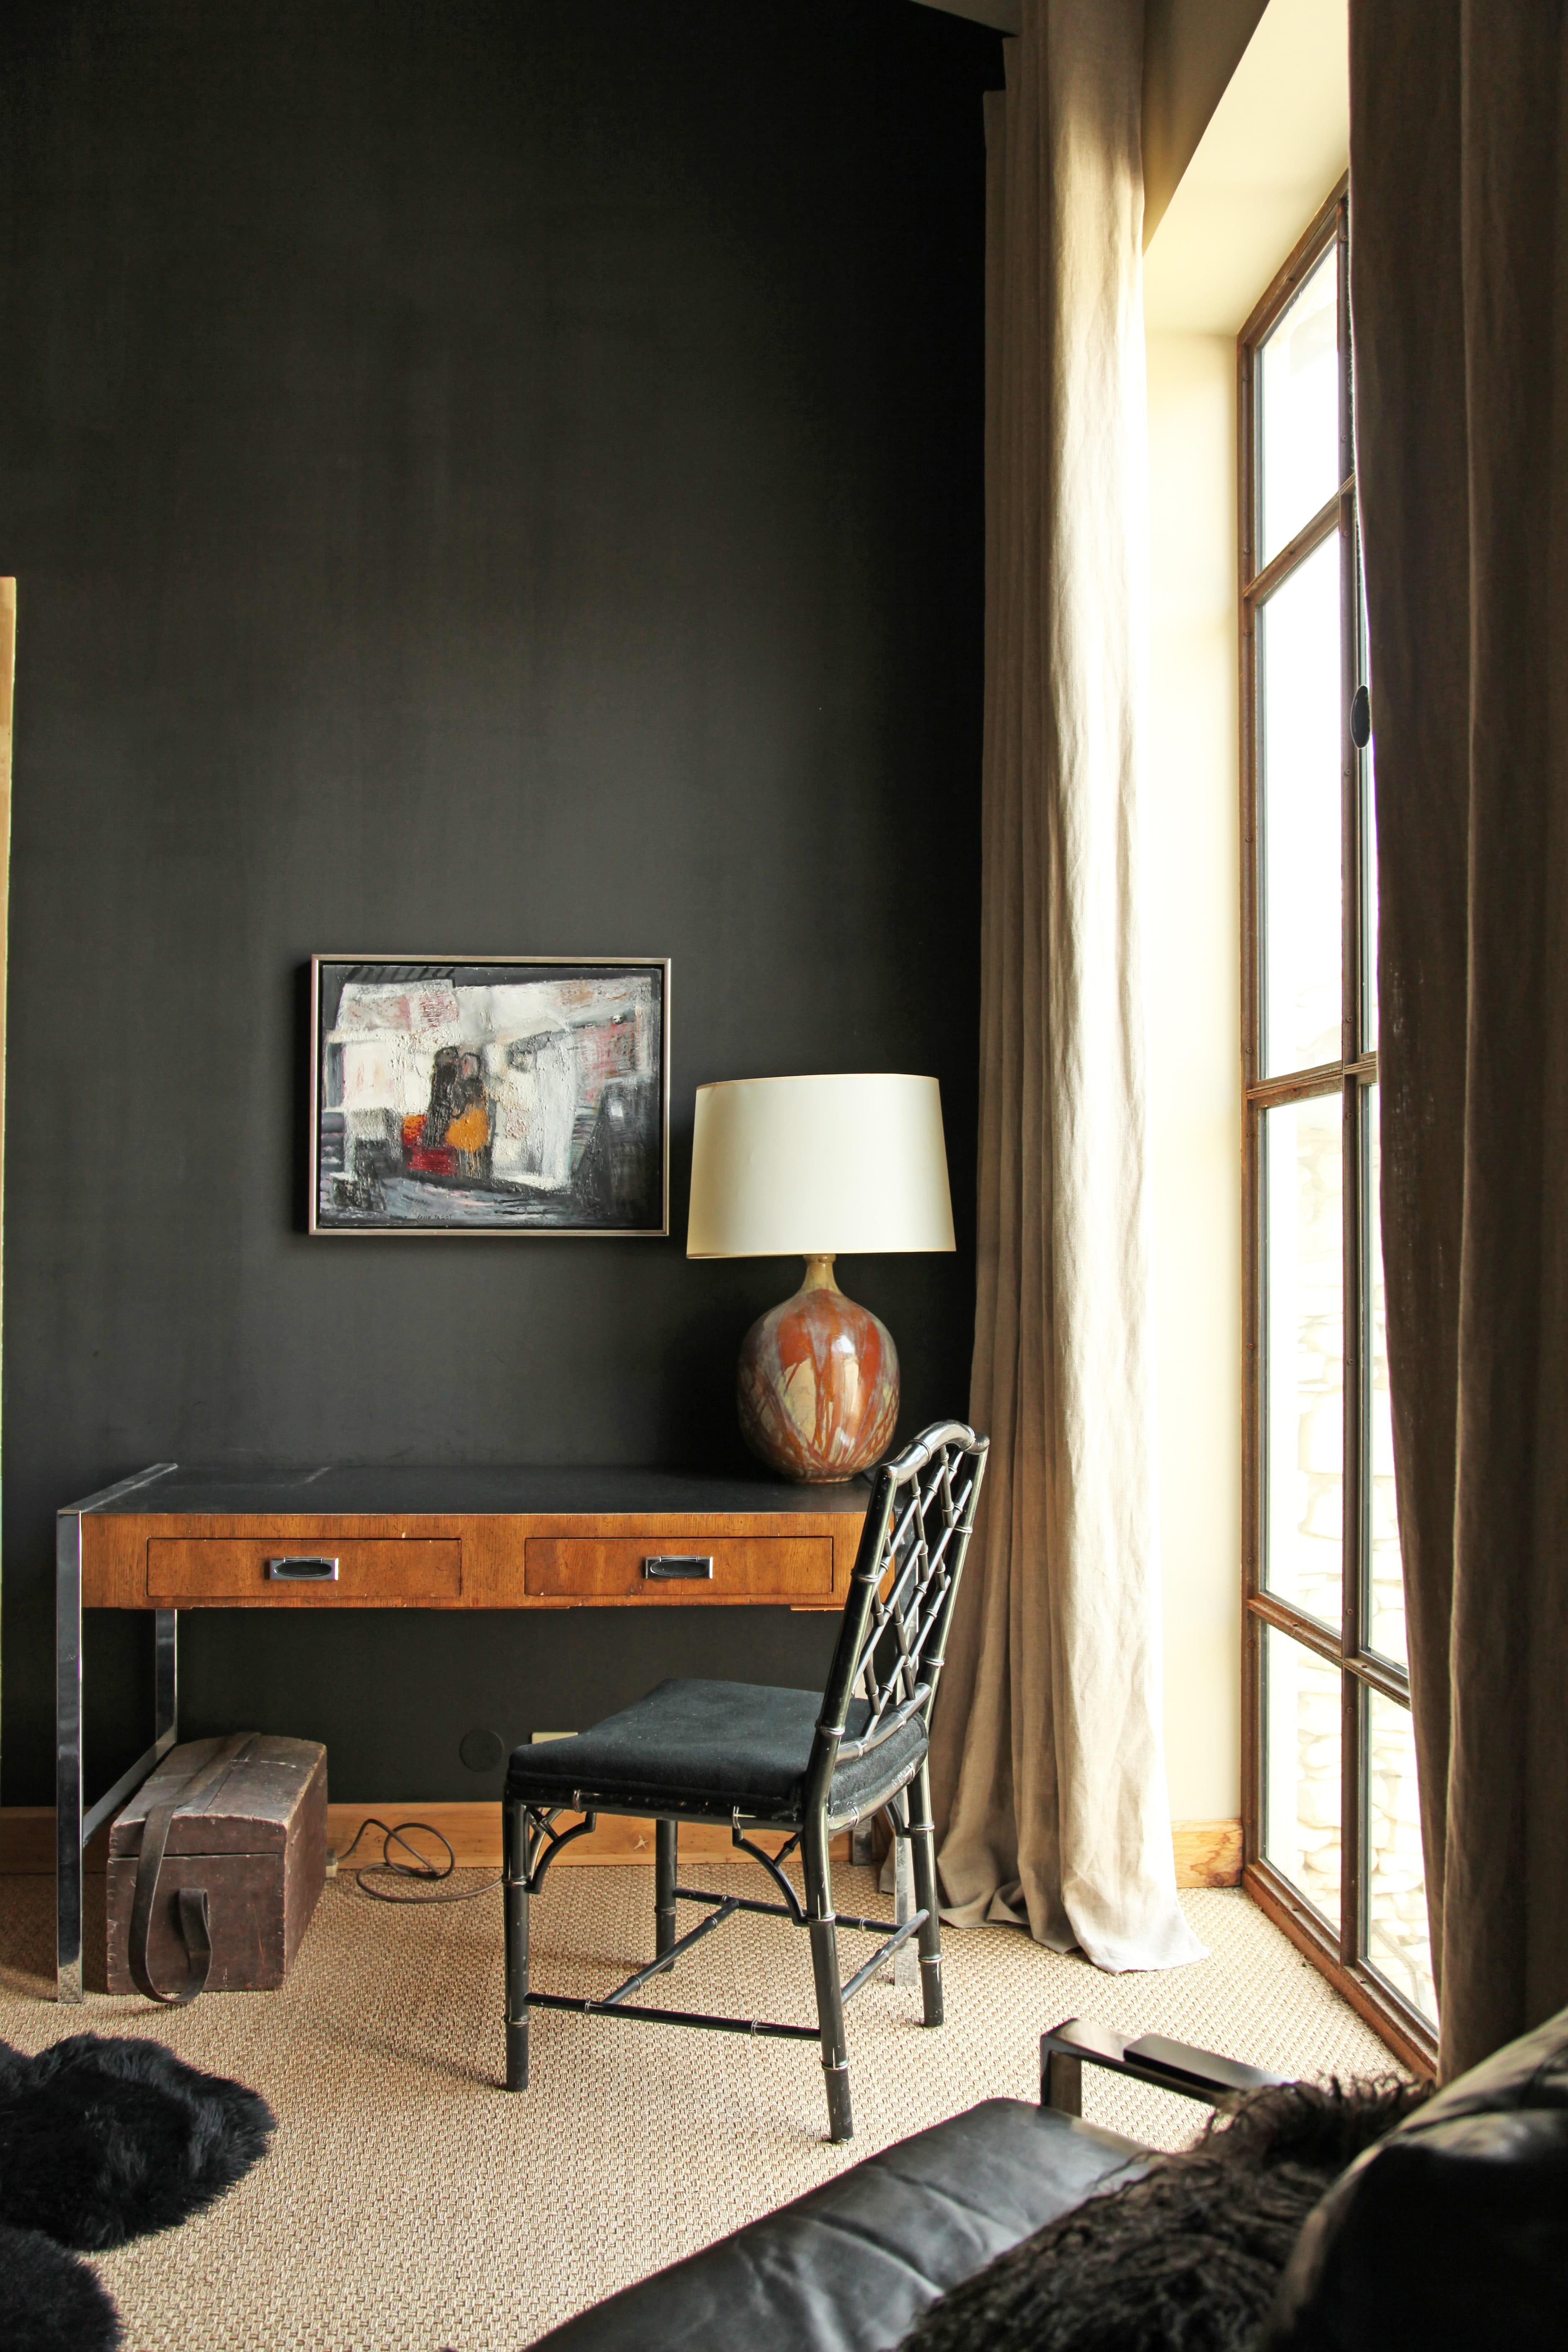 la d co rejoue ses classiques. Black Bedroom Furniture Sets. Home Design Ideas